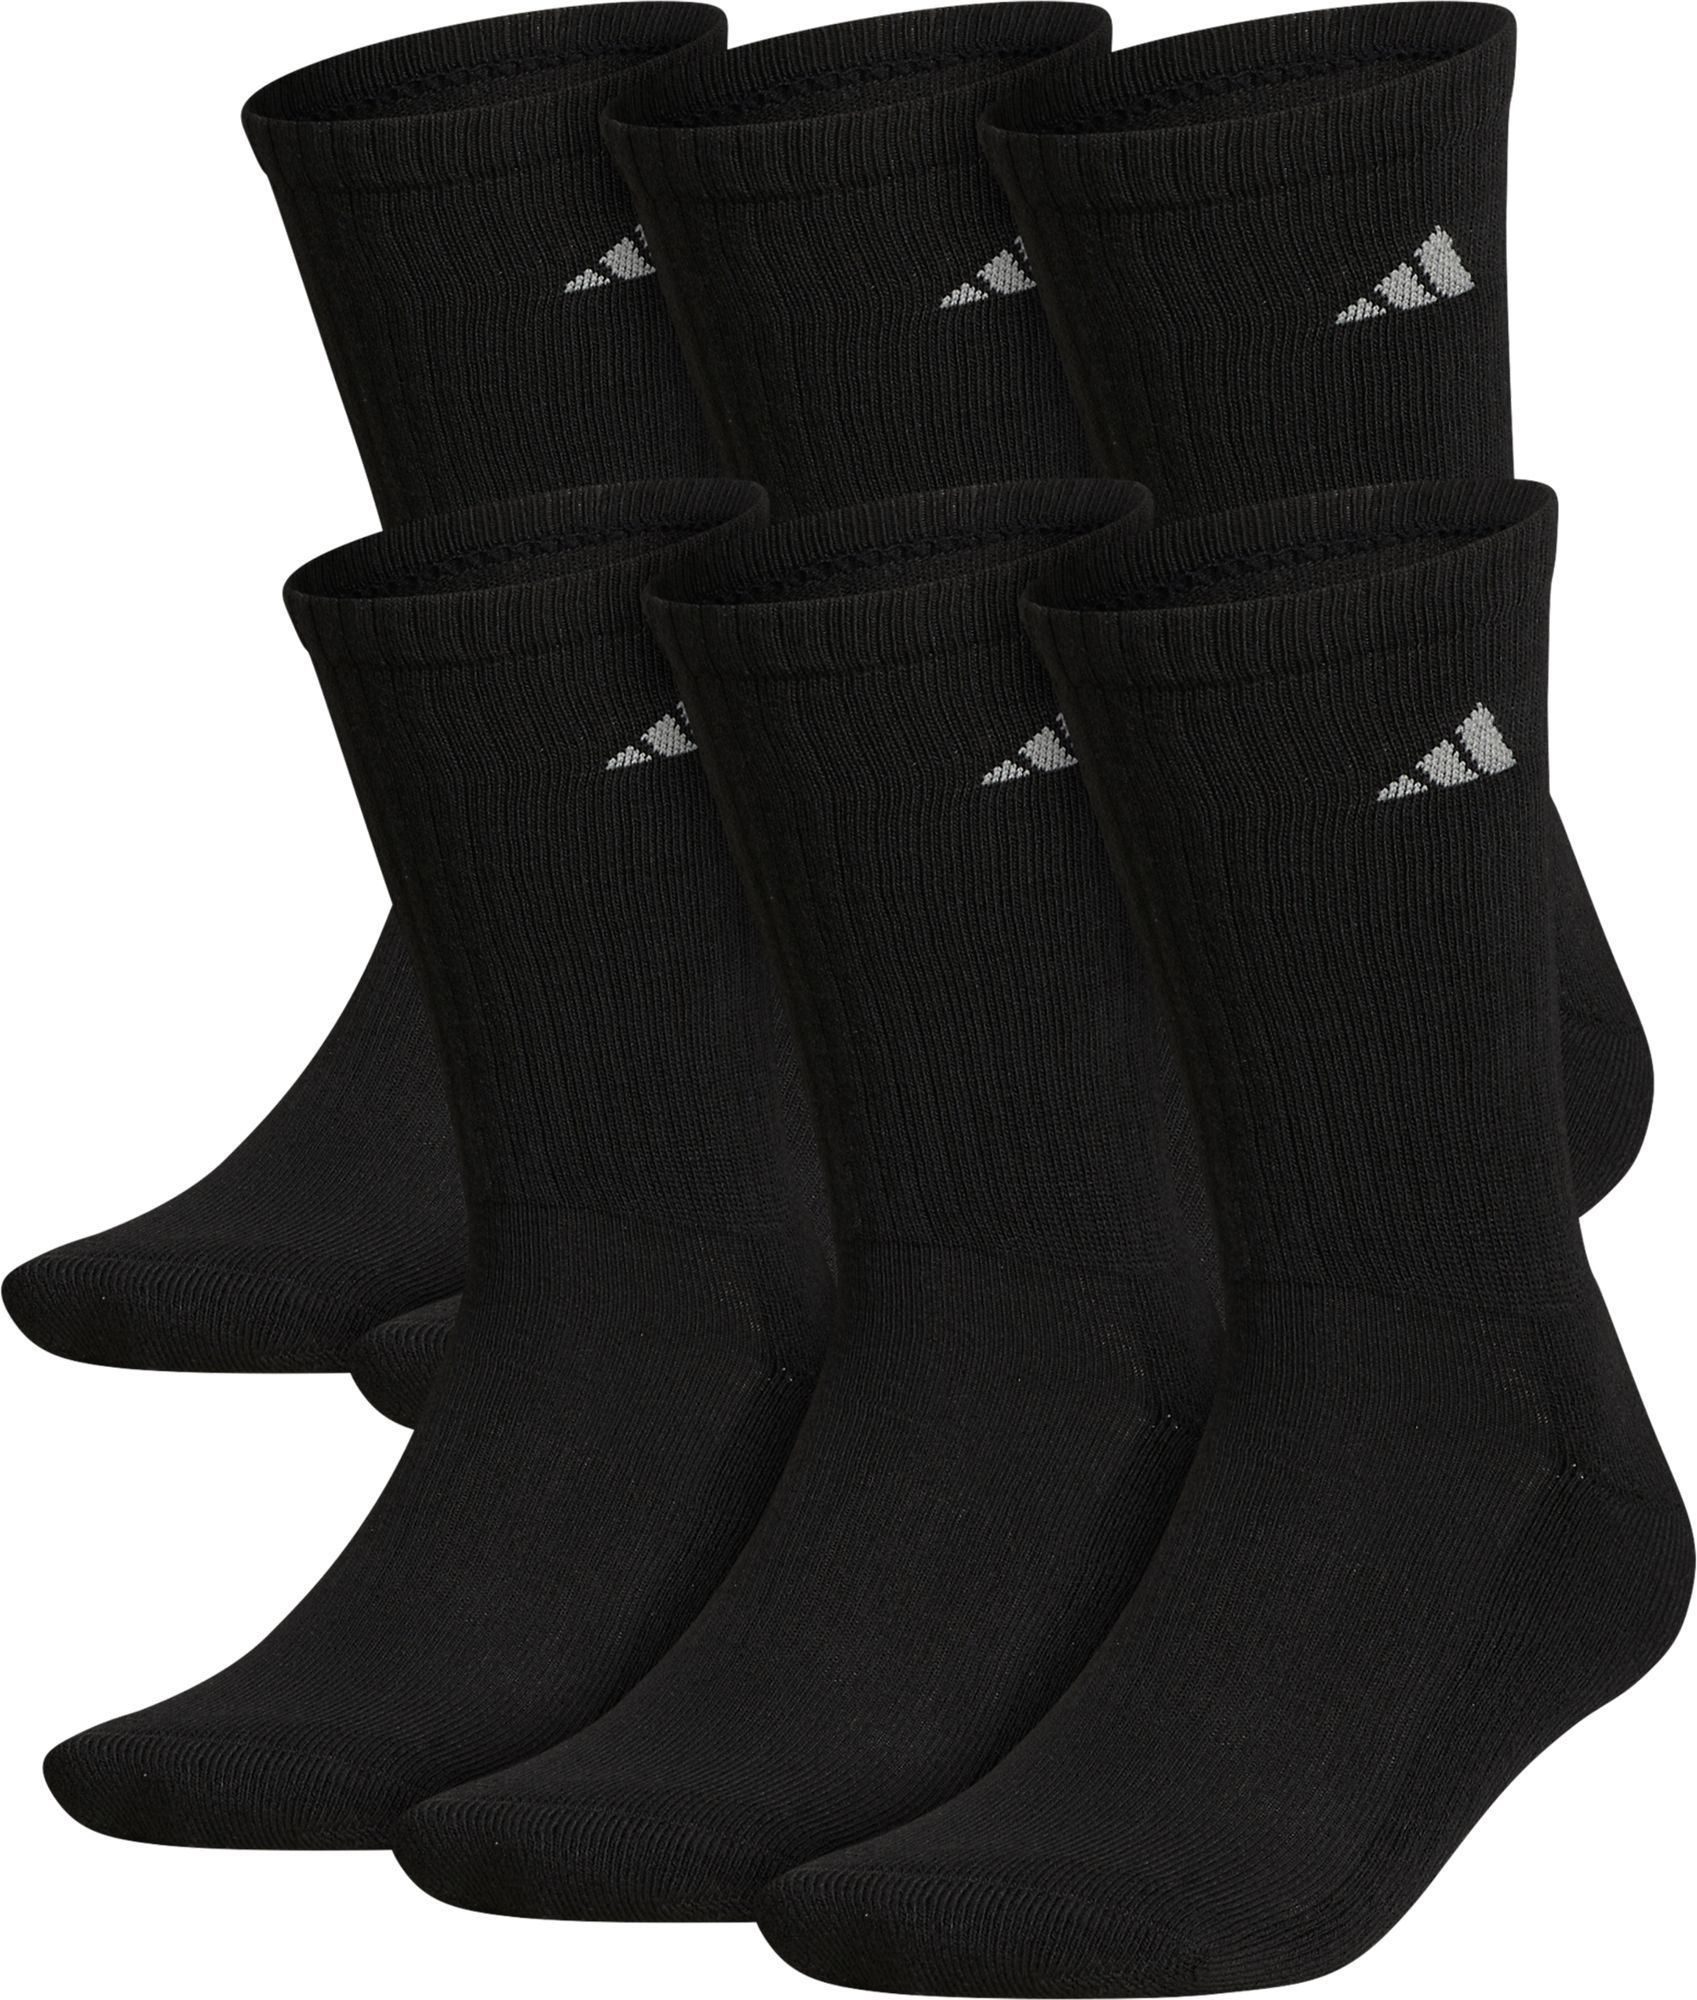 Calcetines deportivos adidas hombres, para 6 hombres, 6 unidades unidades | bb1f2ed - hvorvikankobe.website